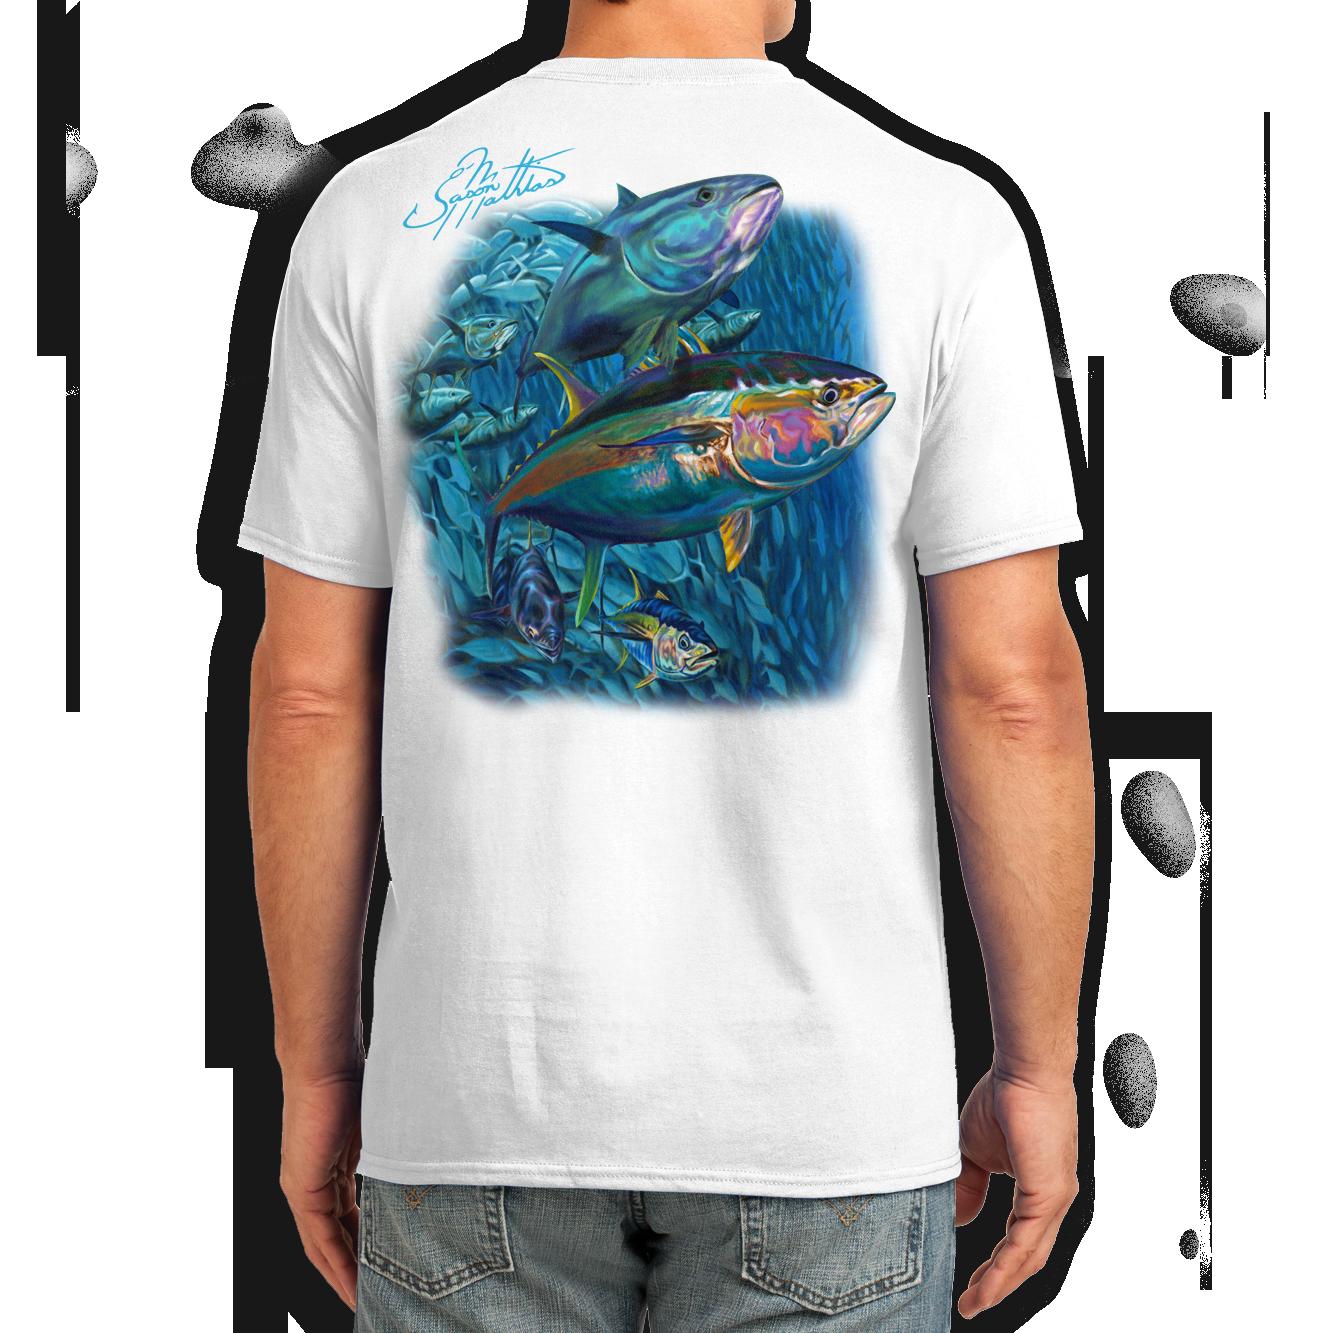 t-shirt-short-sleeve-white-jason-mathias-art-tuna.png